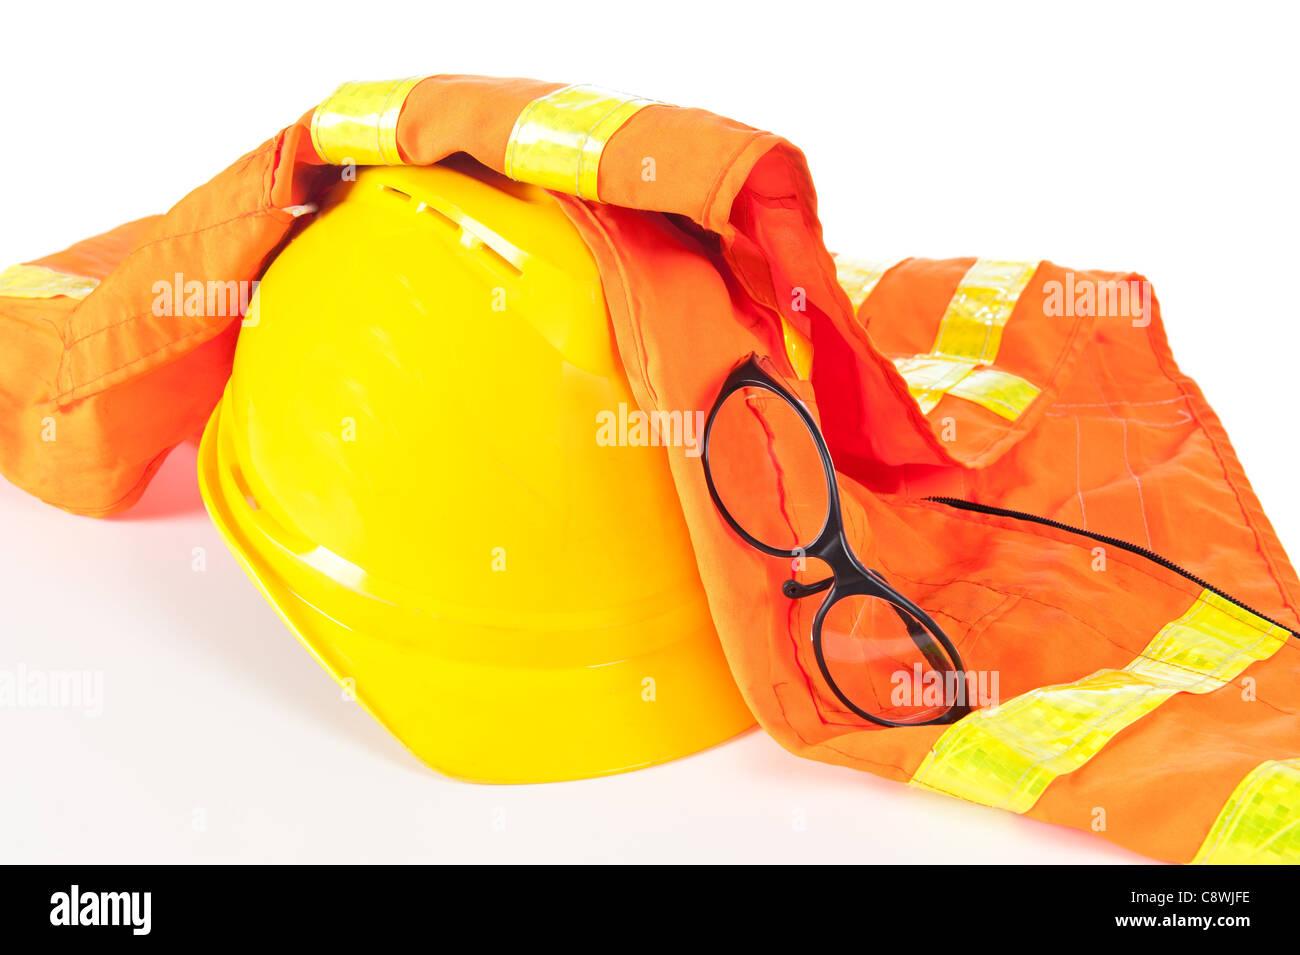 Hard hat, reflective orange vest and safety glasses on white. - Stock Image